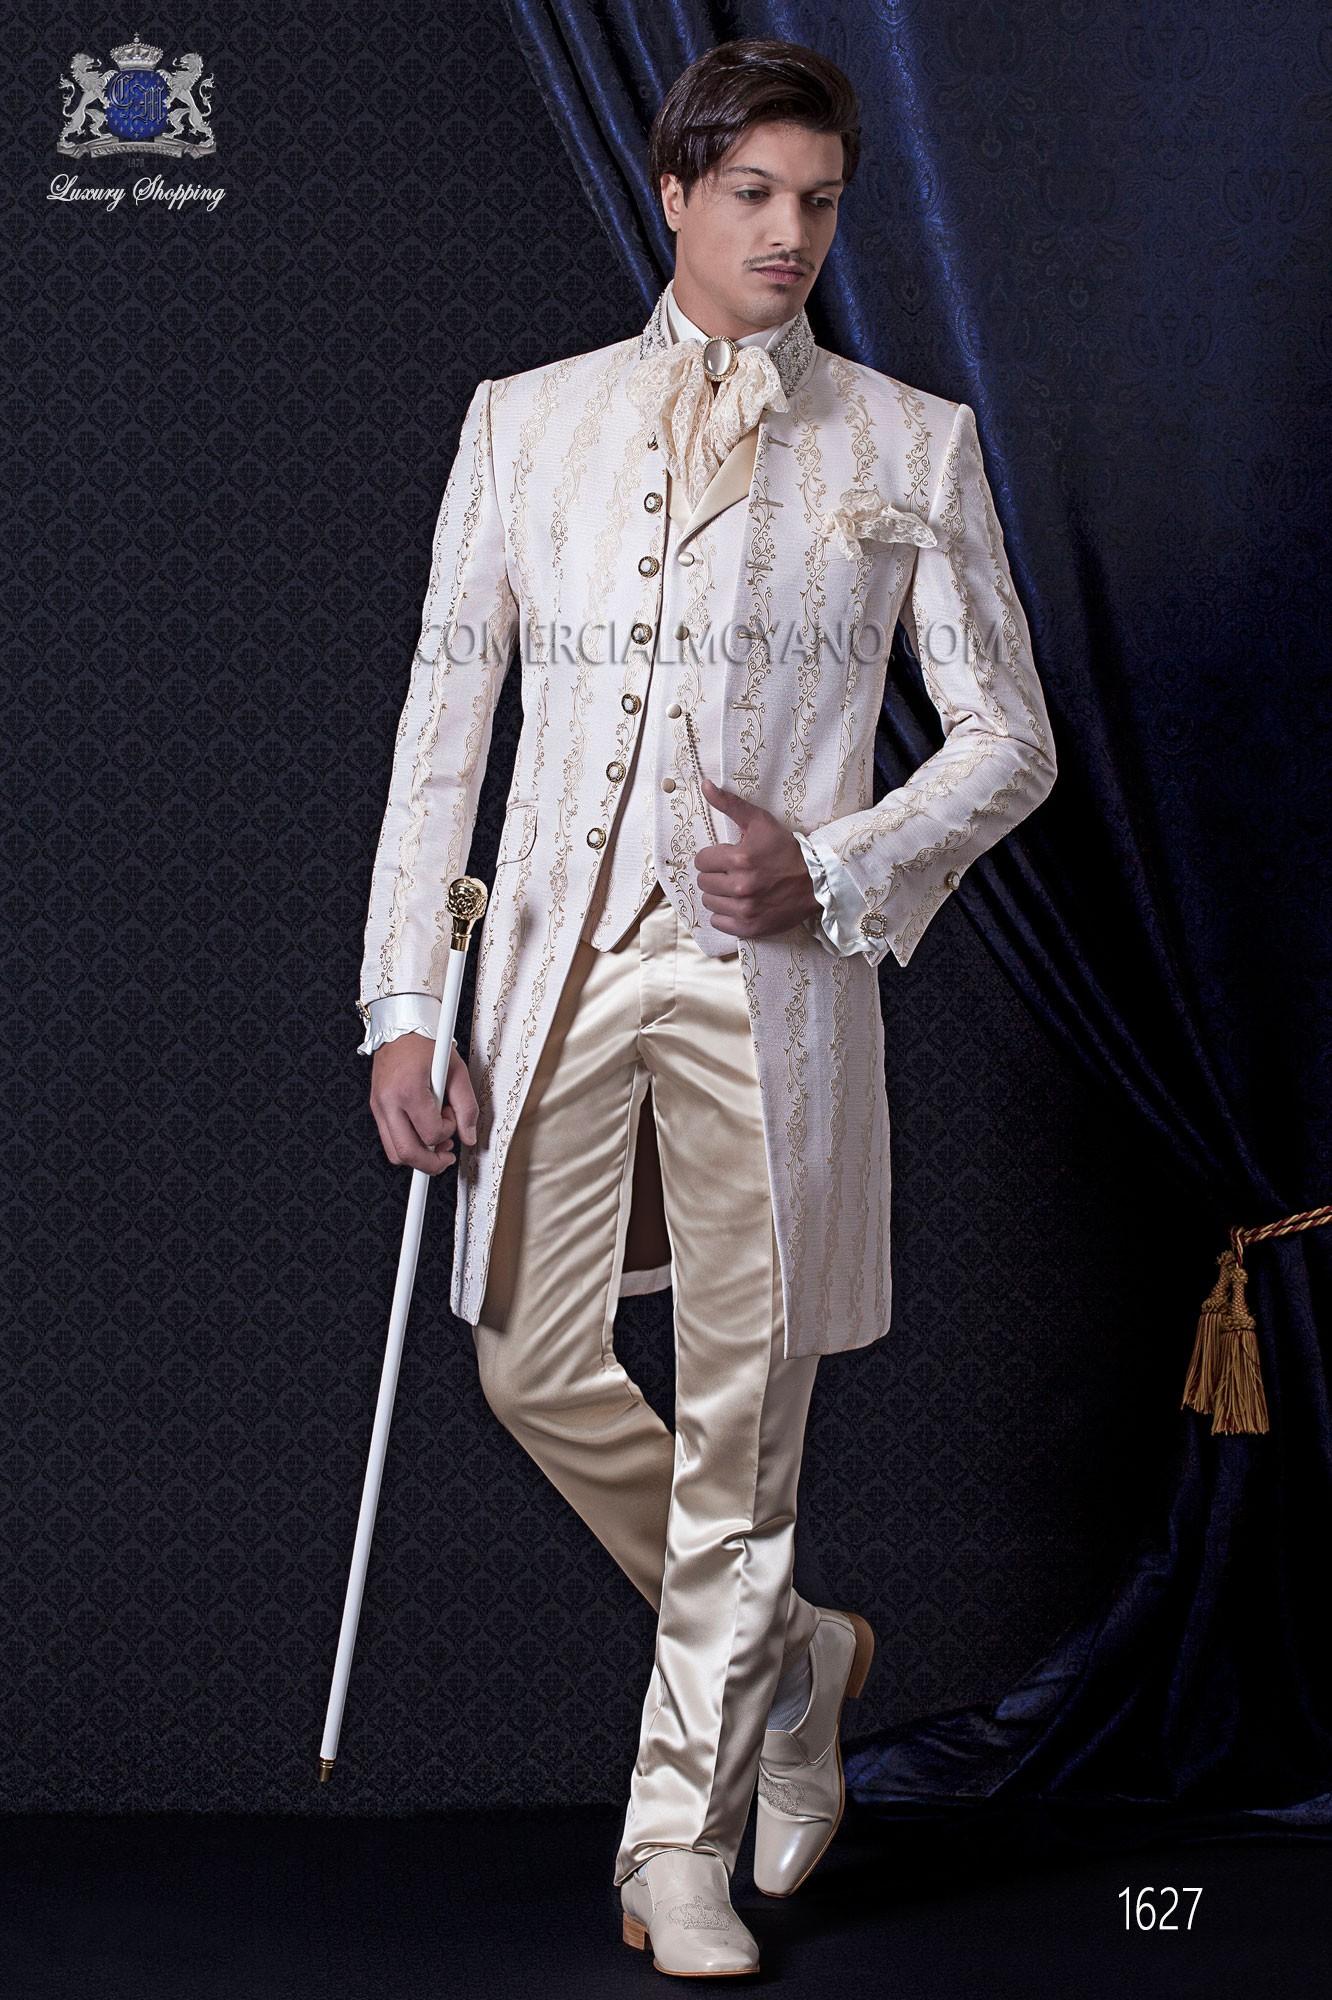 costume de mari baroque veste de costume vintage en tissu de jacquard ivoire avec strass. Black Bedroom Furniture Sets. Home Design Ideas